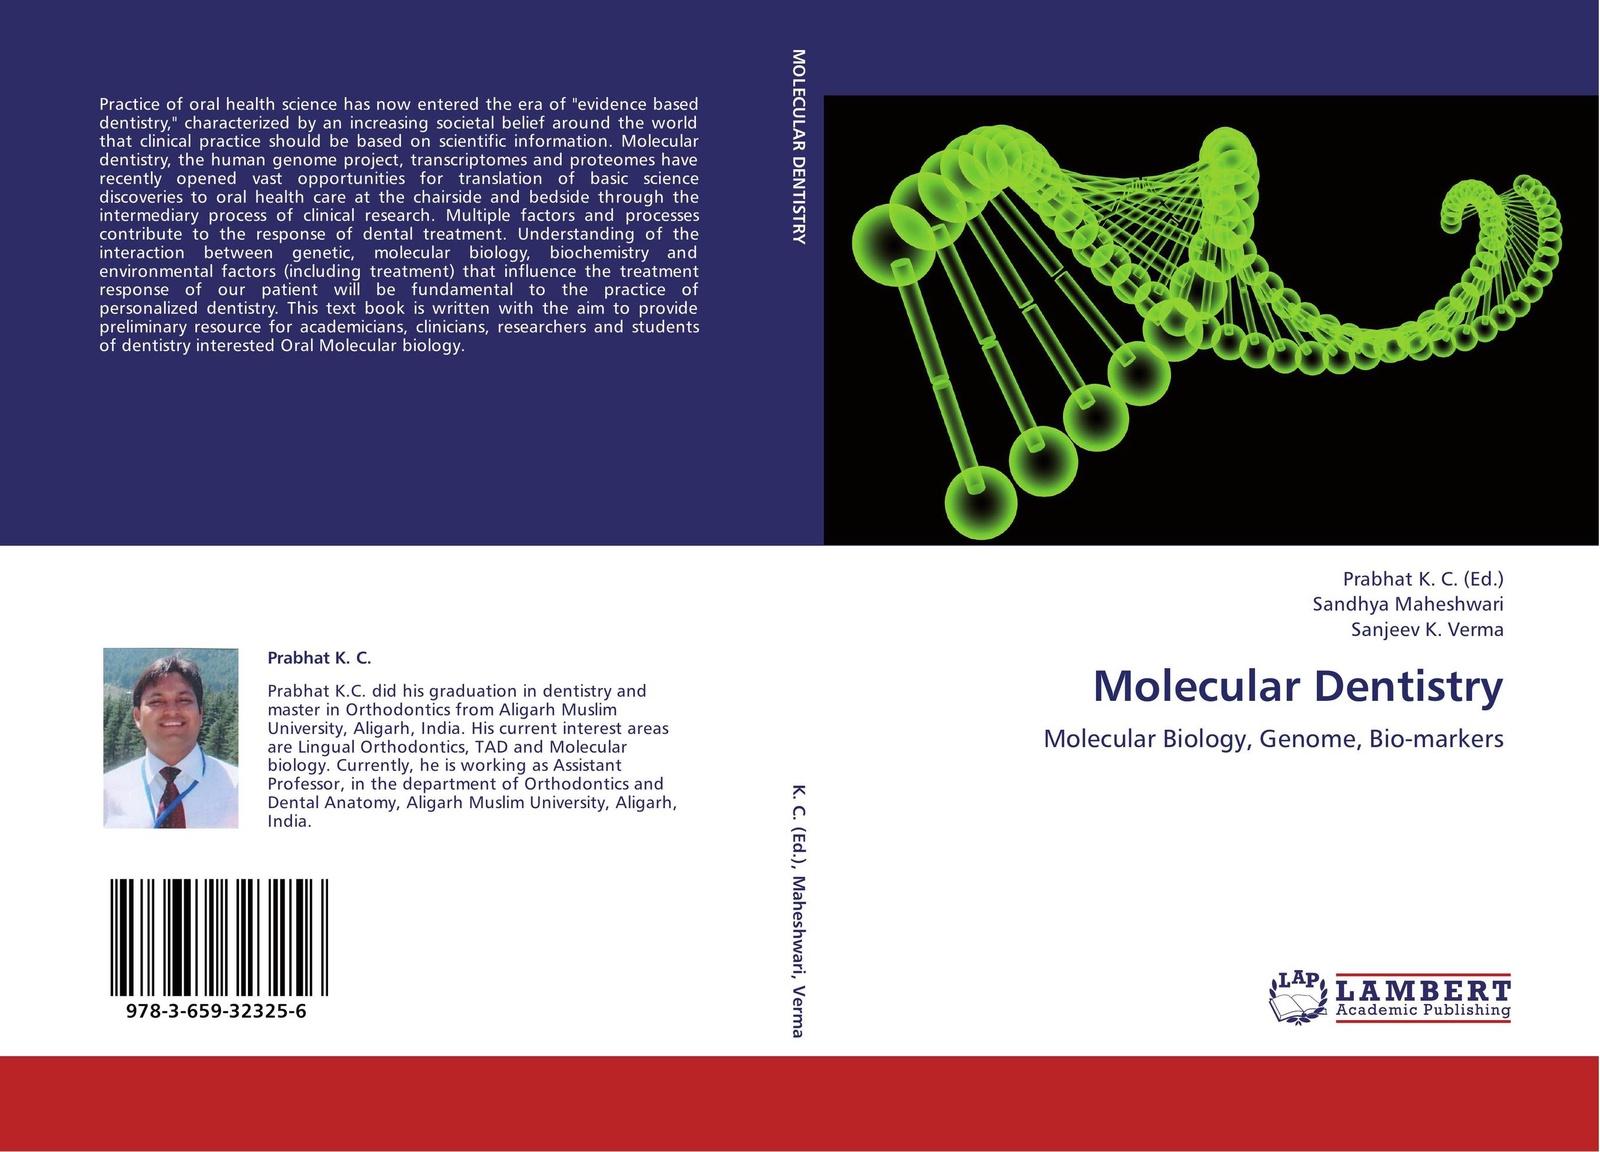 Prabhat K. C.,Sandhya Maheshwari and Sanjeev K. Verma Molecular Dentistry david murphy molecular neuroendocrinology from genome to physiology